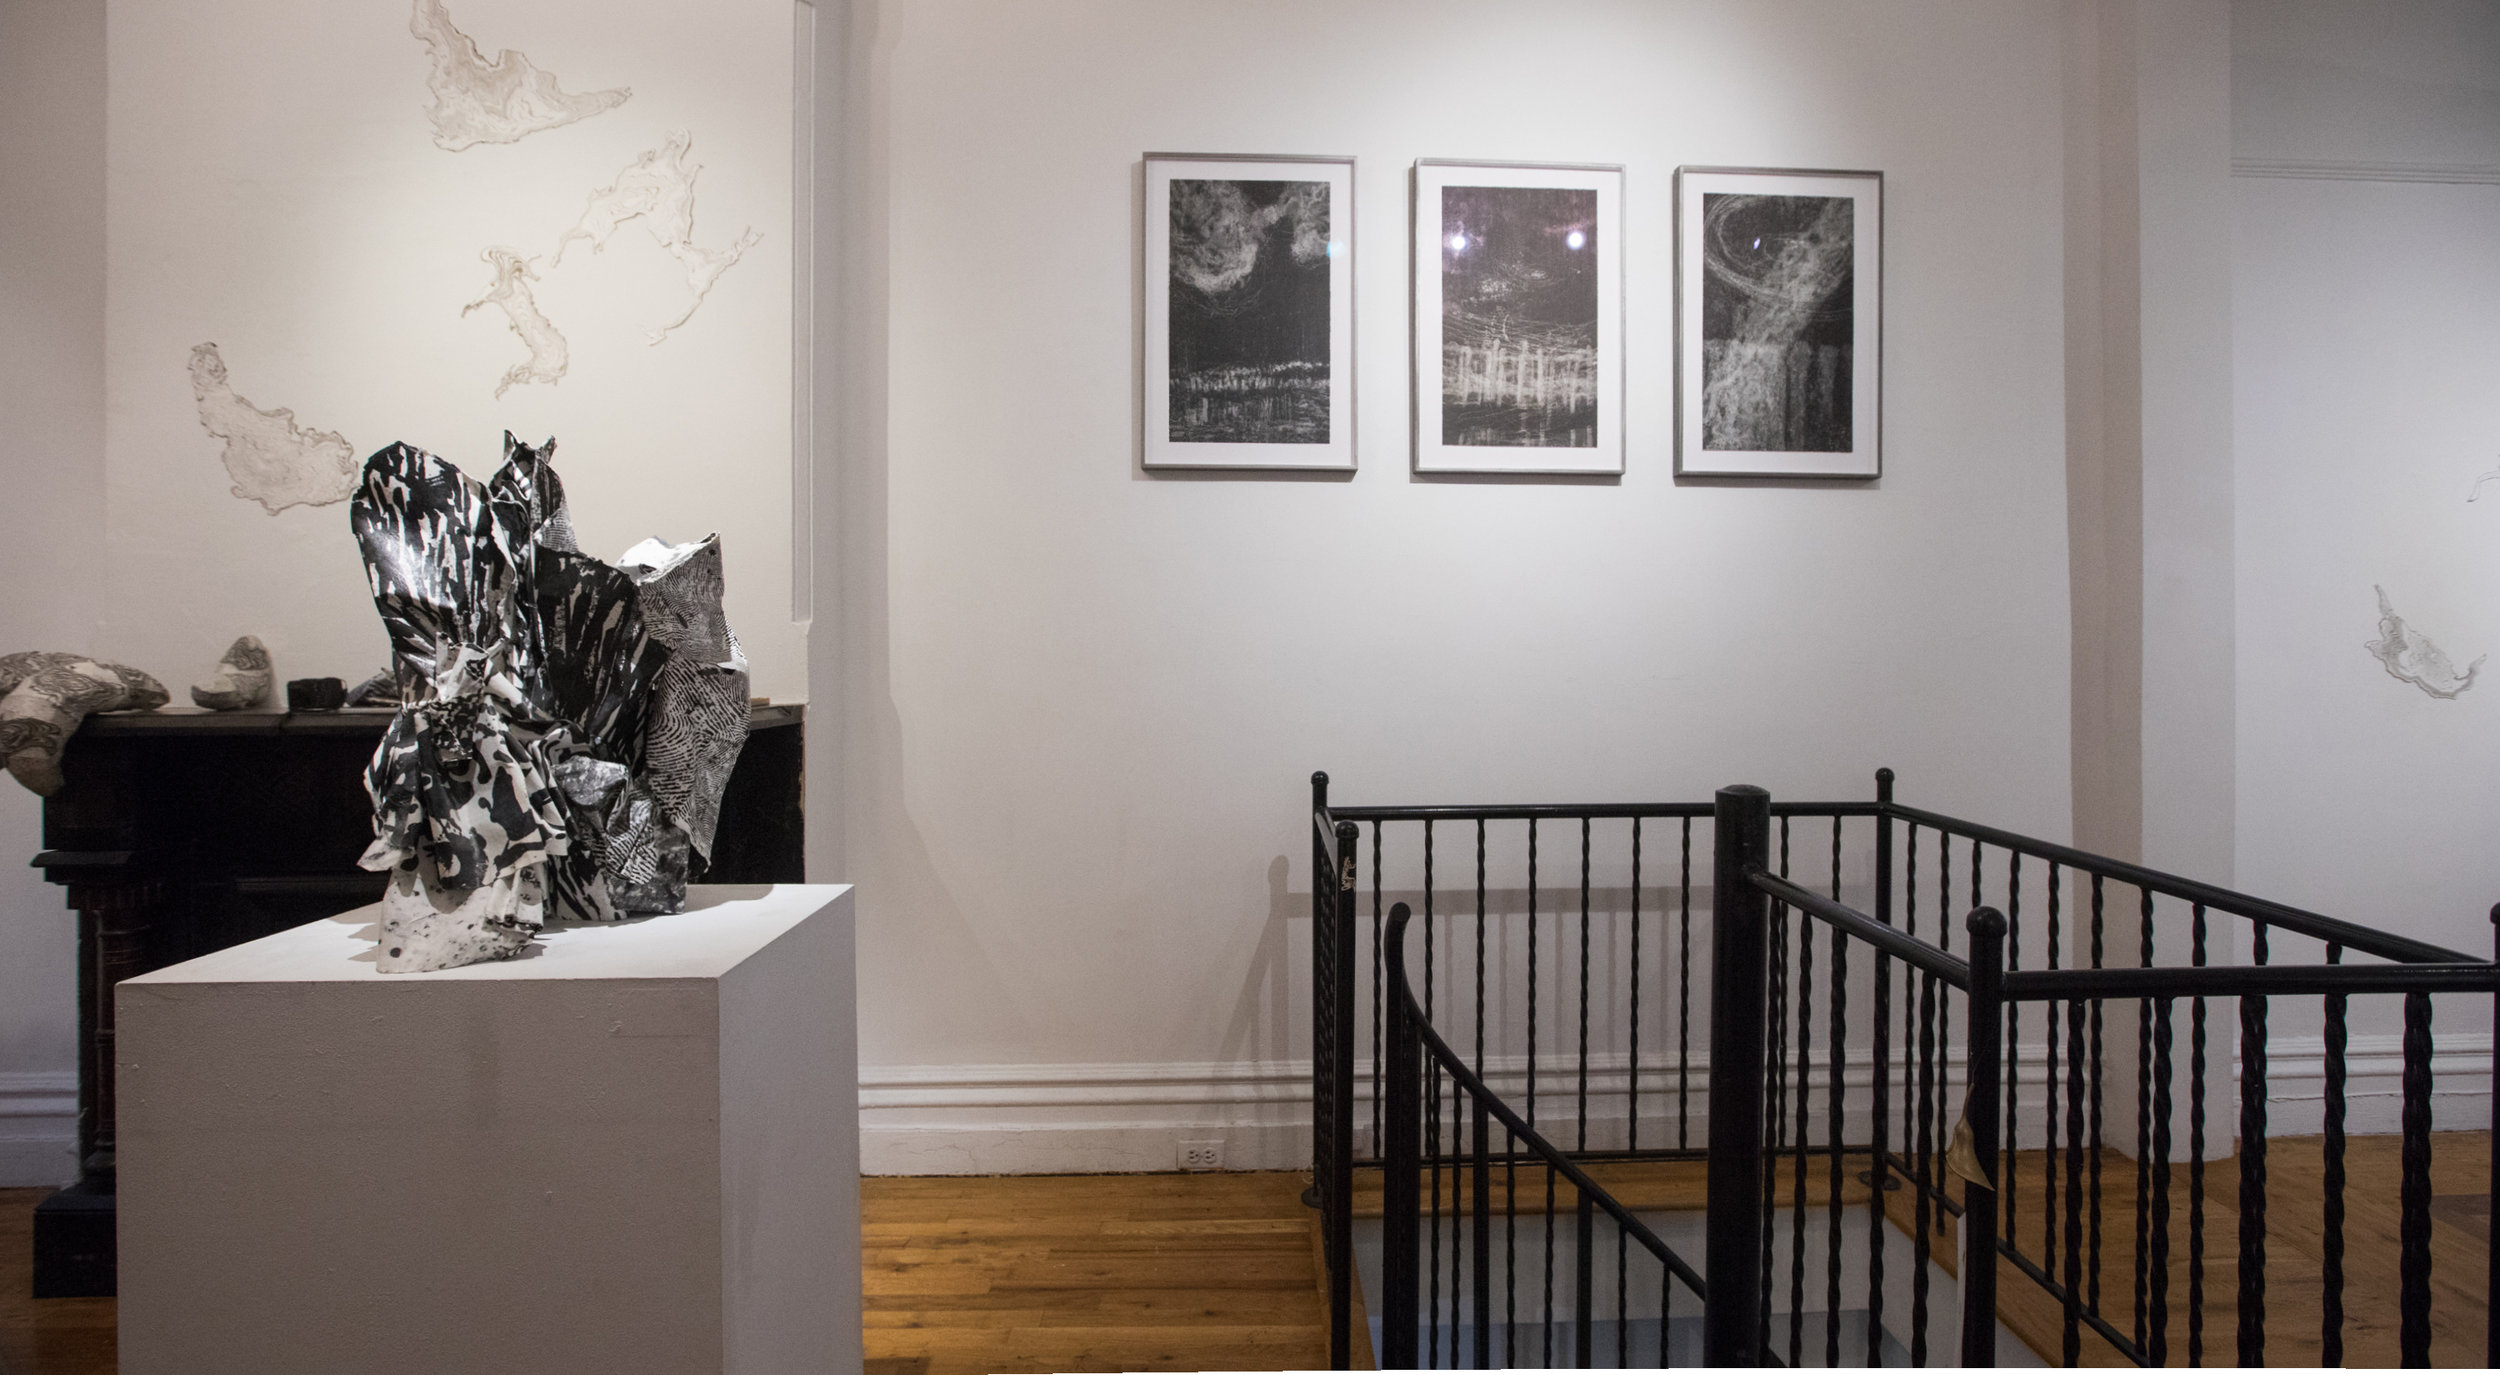 Installation view of  Jisook Kim & Hilda Shen: Orogenies , photo credit to Nadia Lin, courtesy Fou Gallery